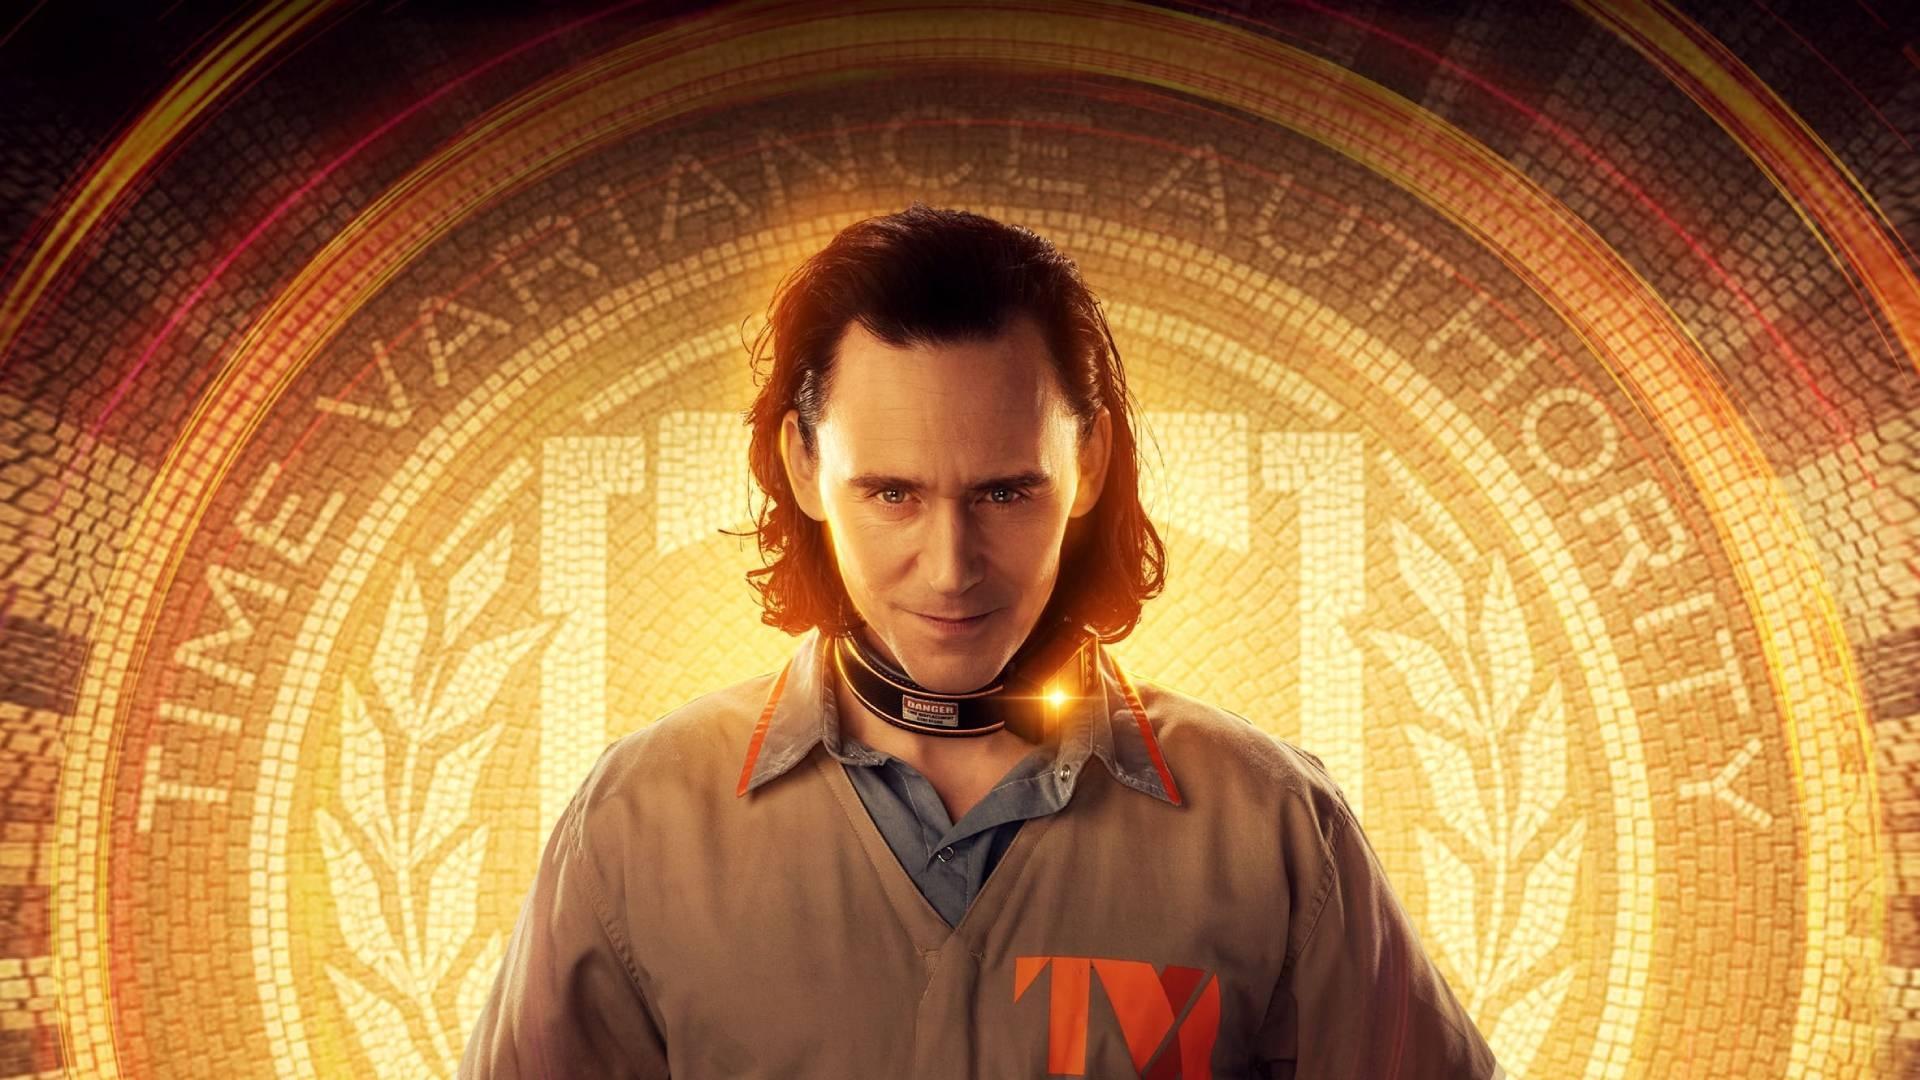 Loki free image